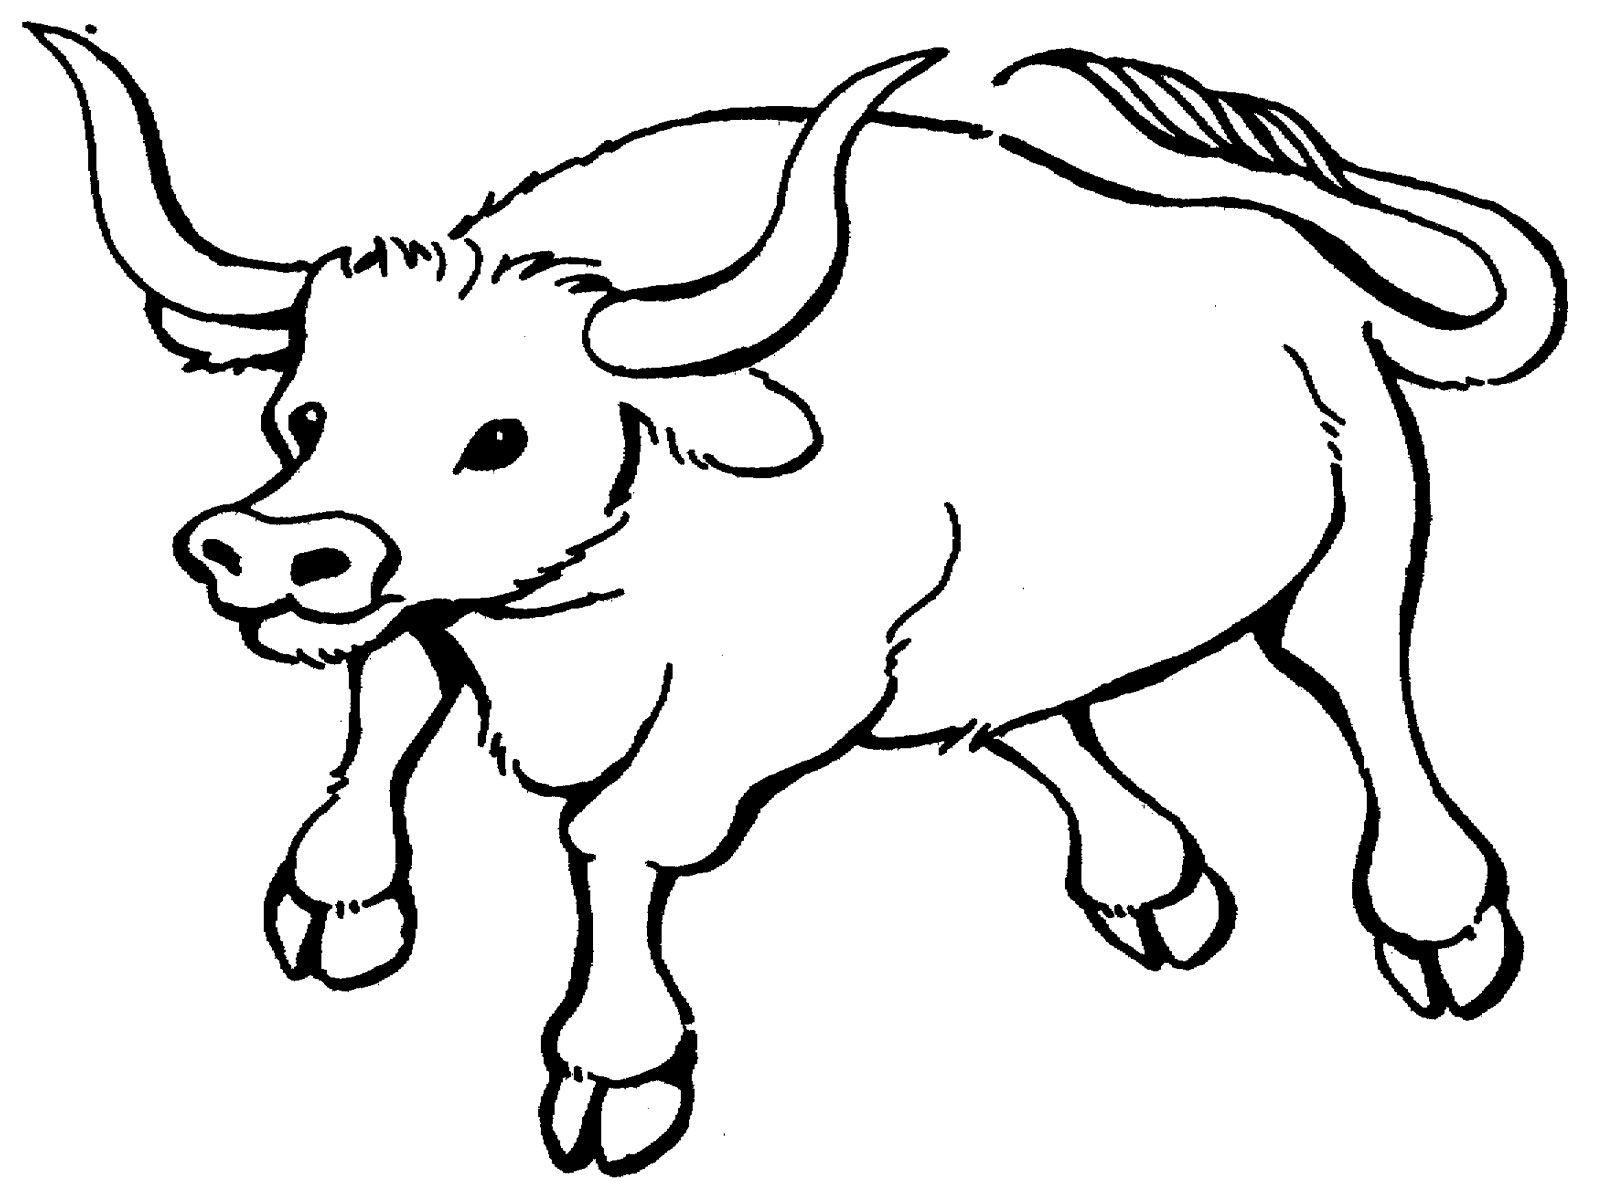 Трафарет на окно - символ Нового года бык